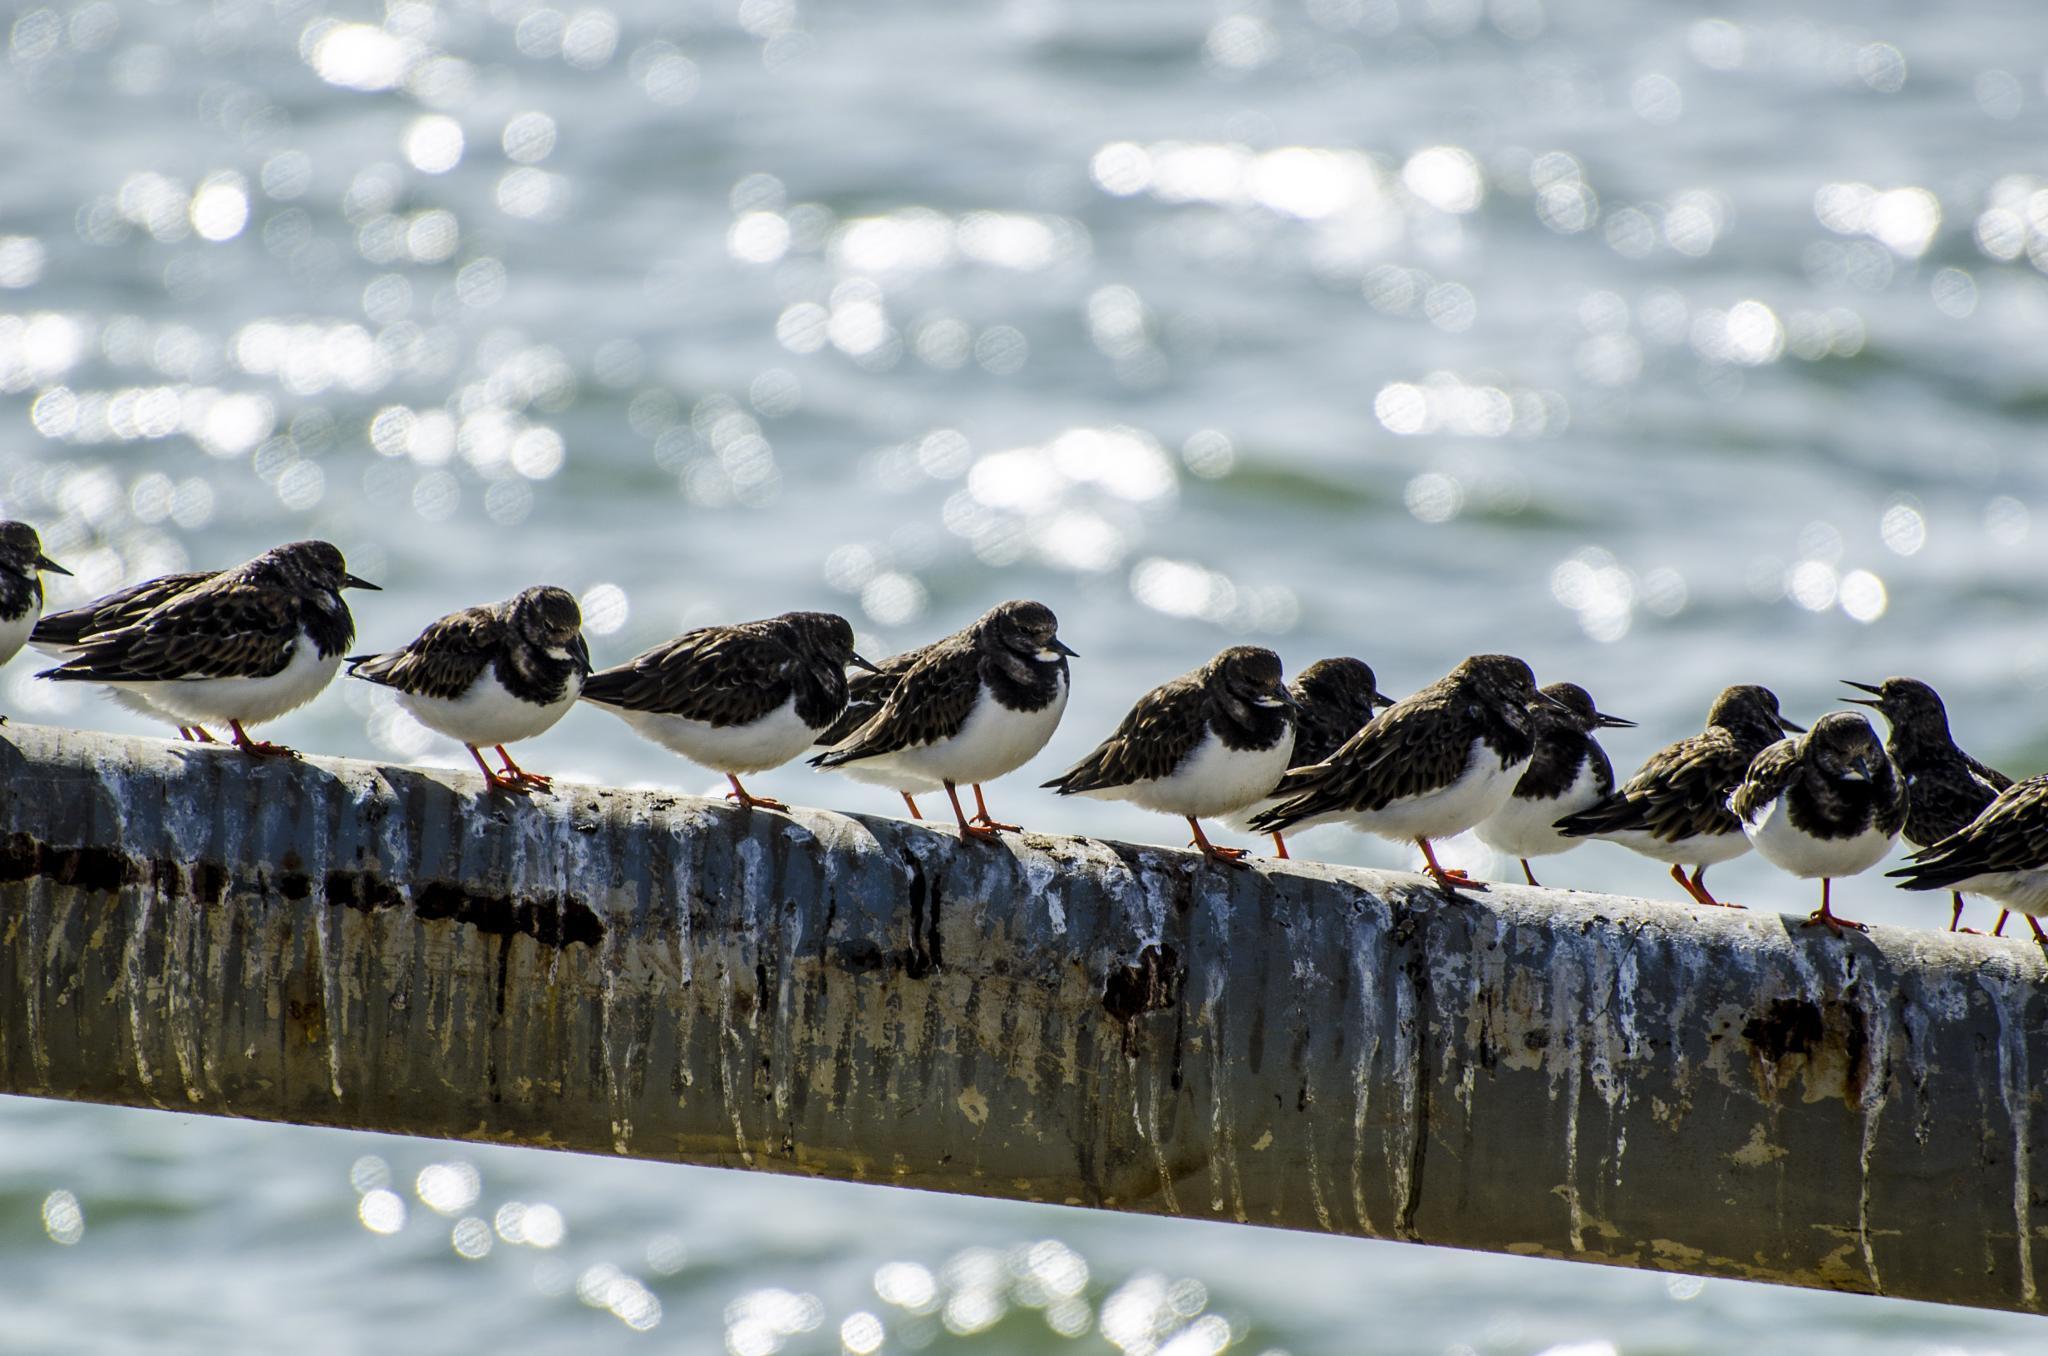 birds on boat by martin.webb.9